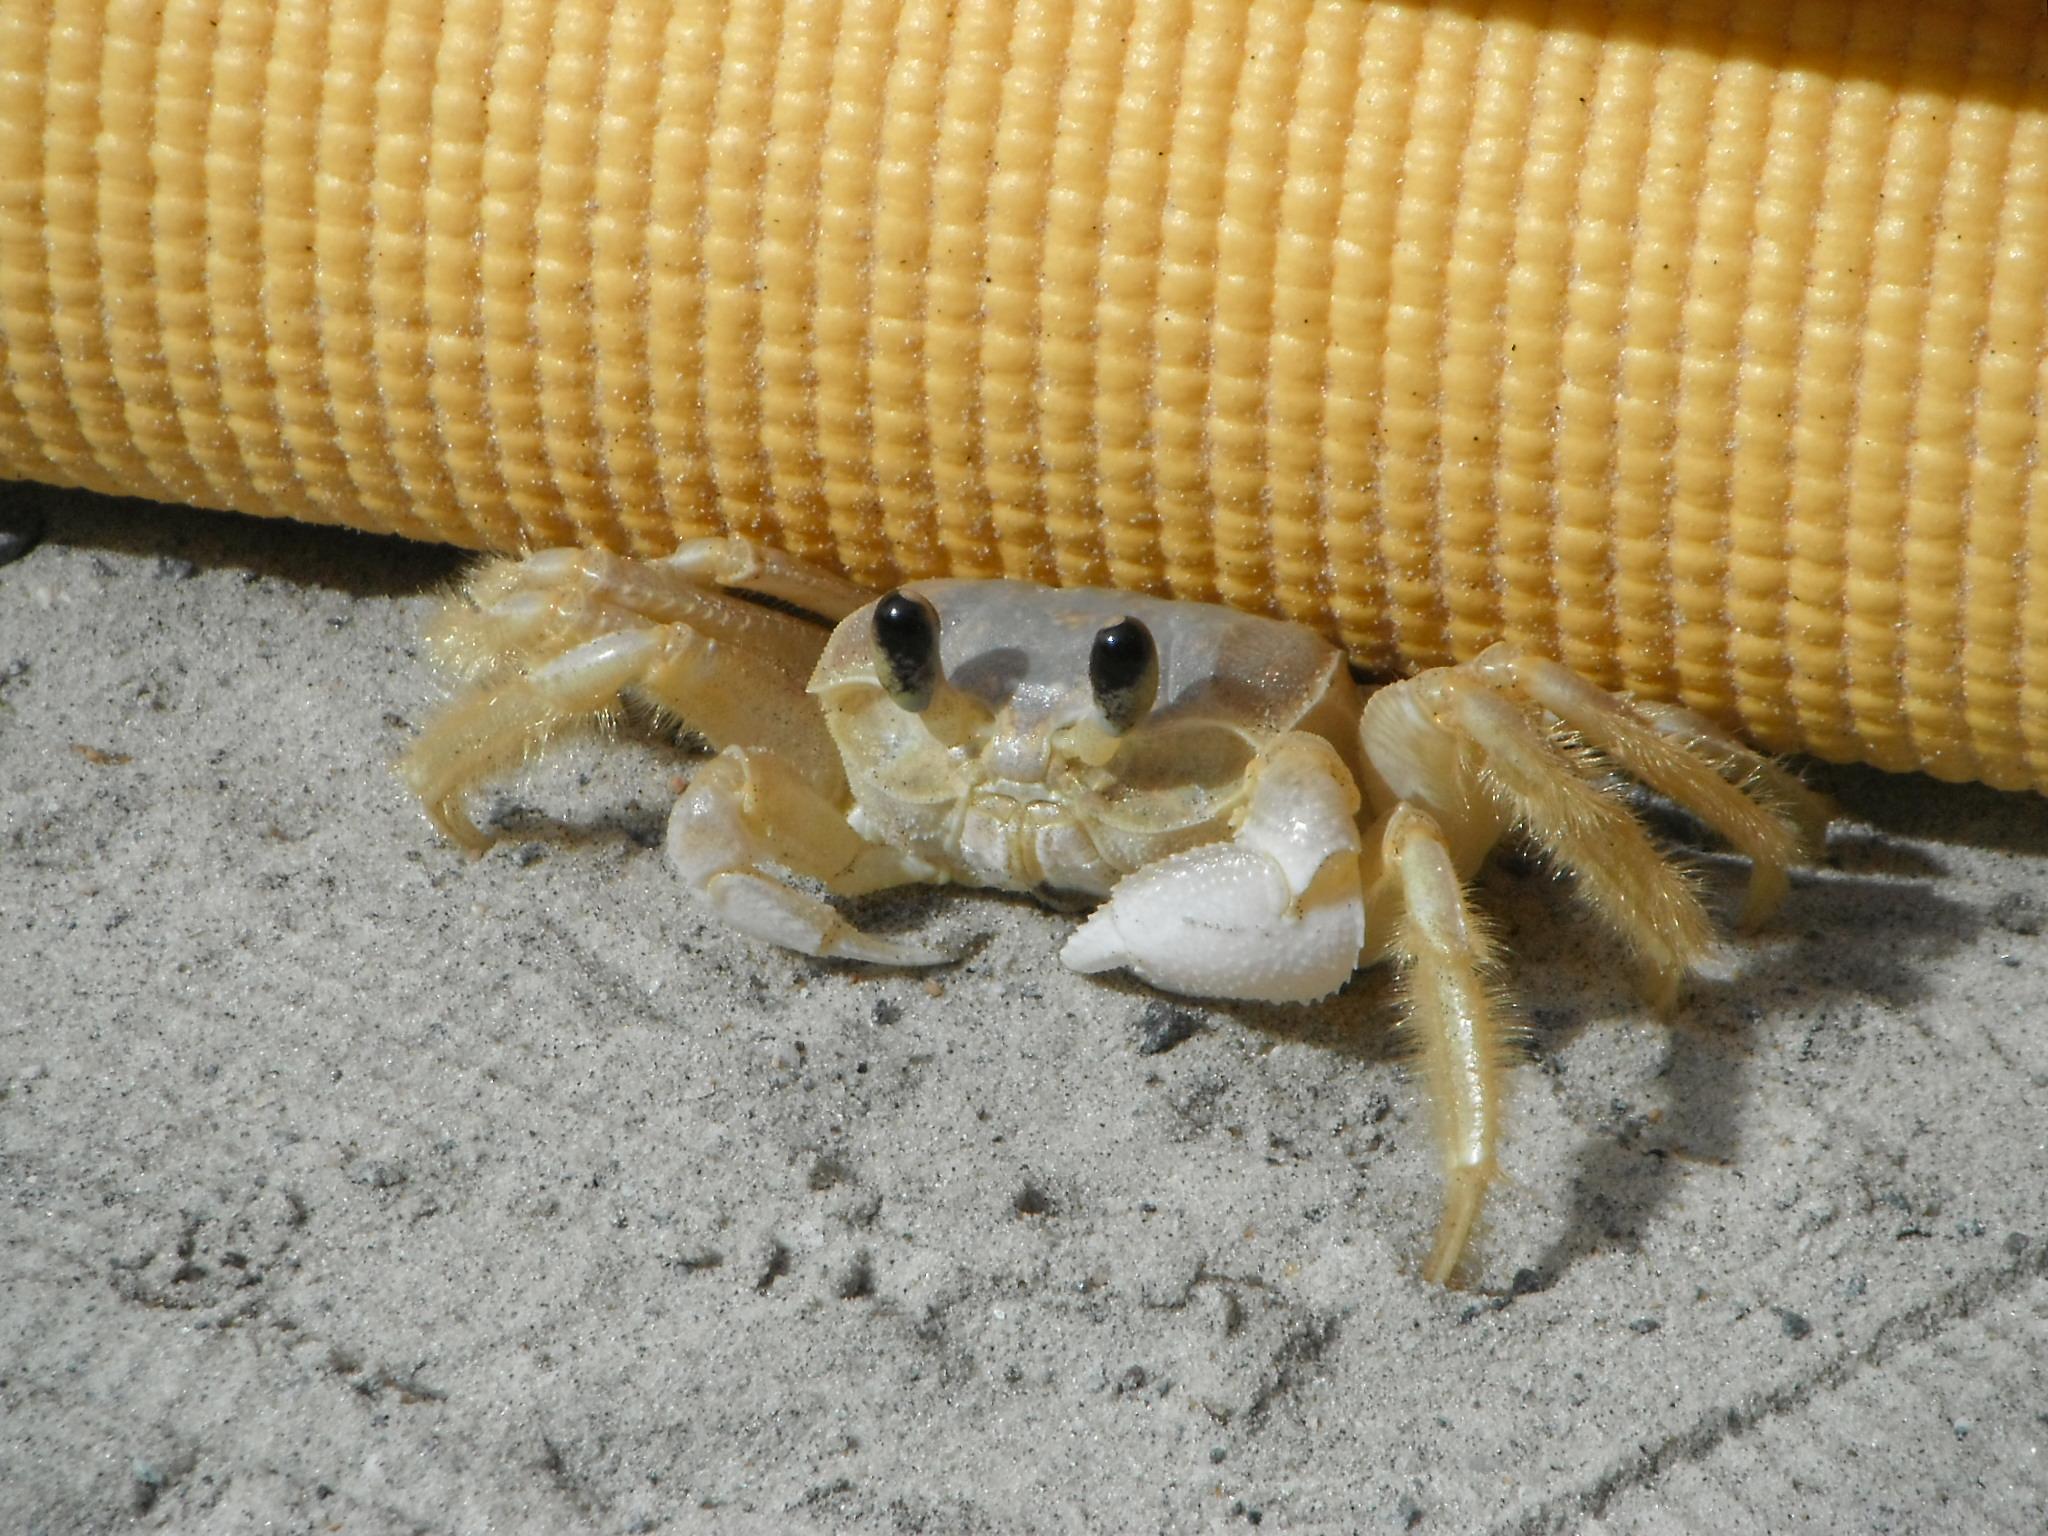 Tiny crab!